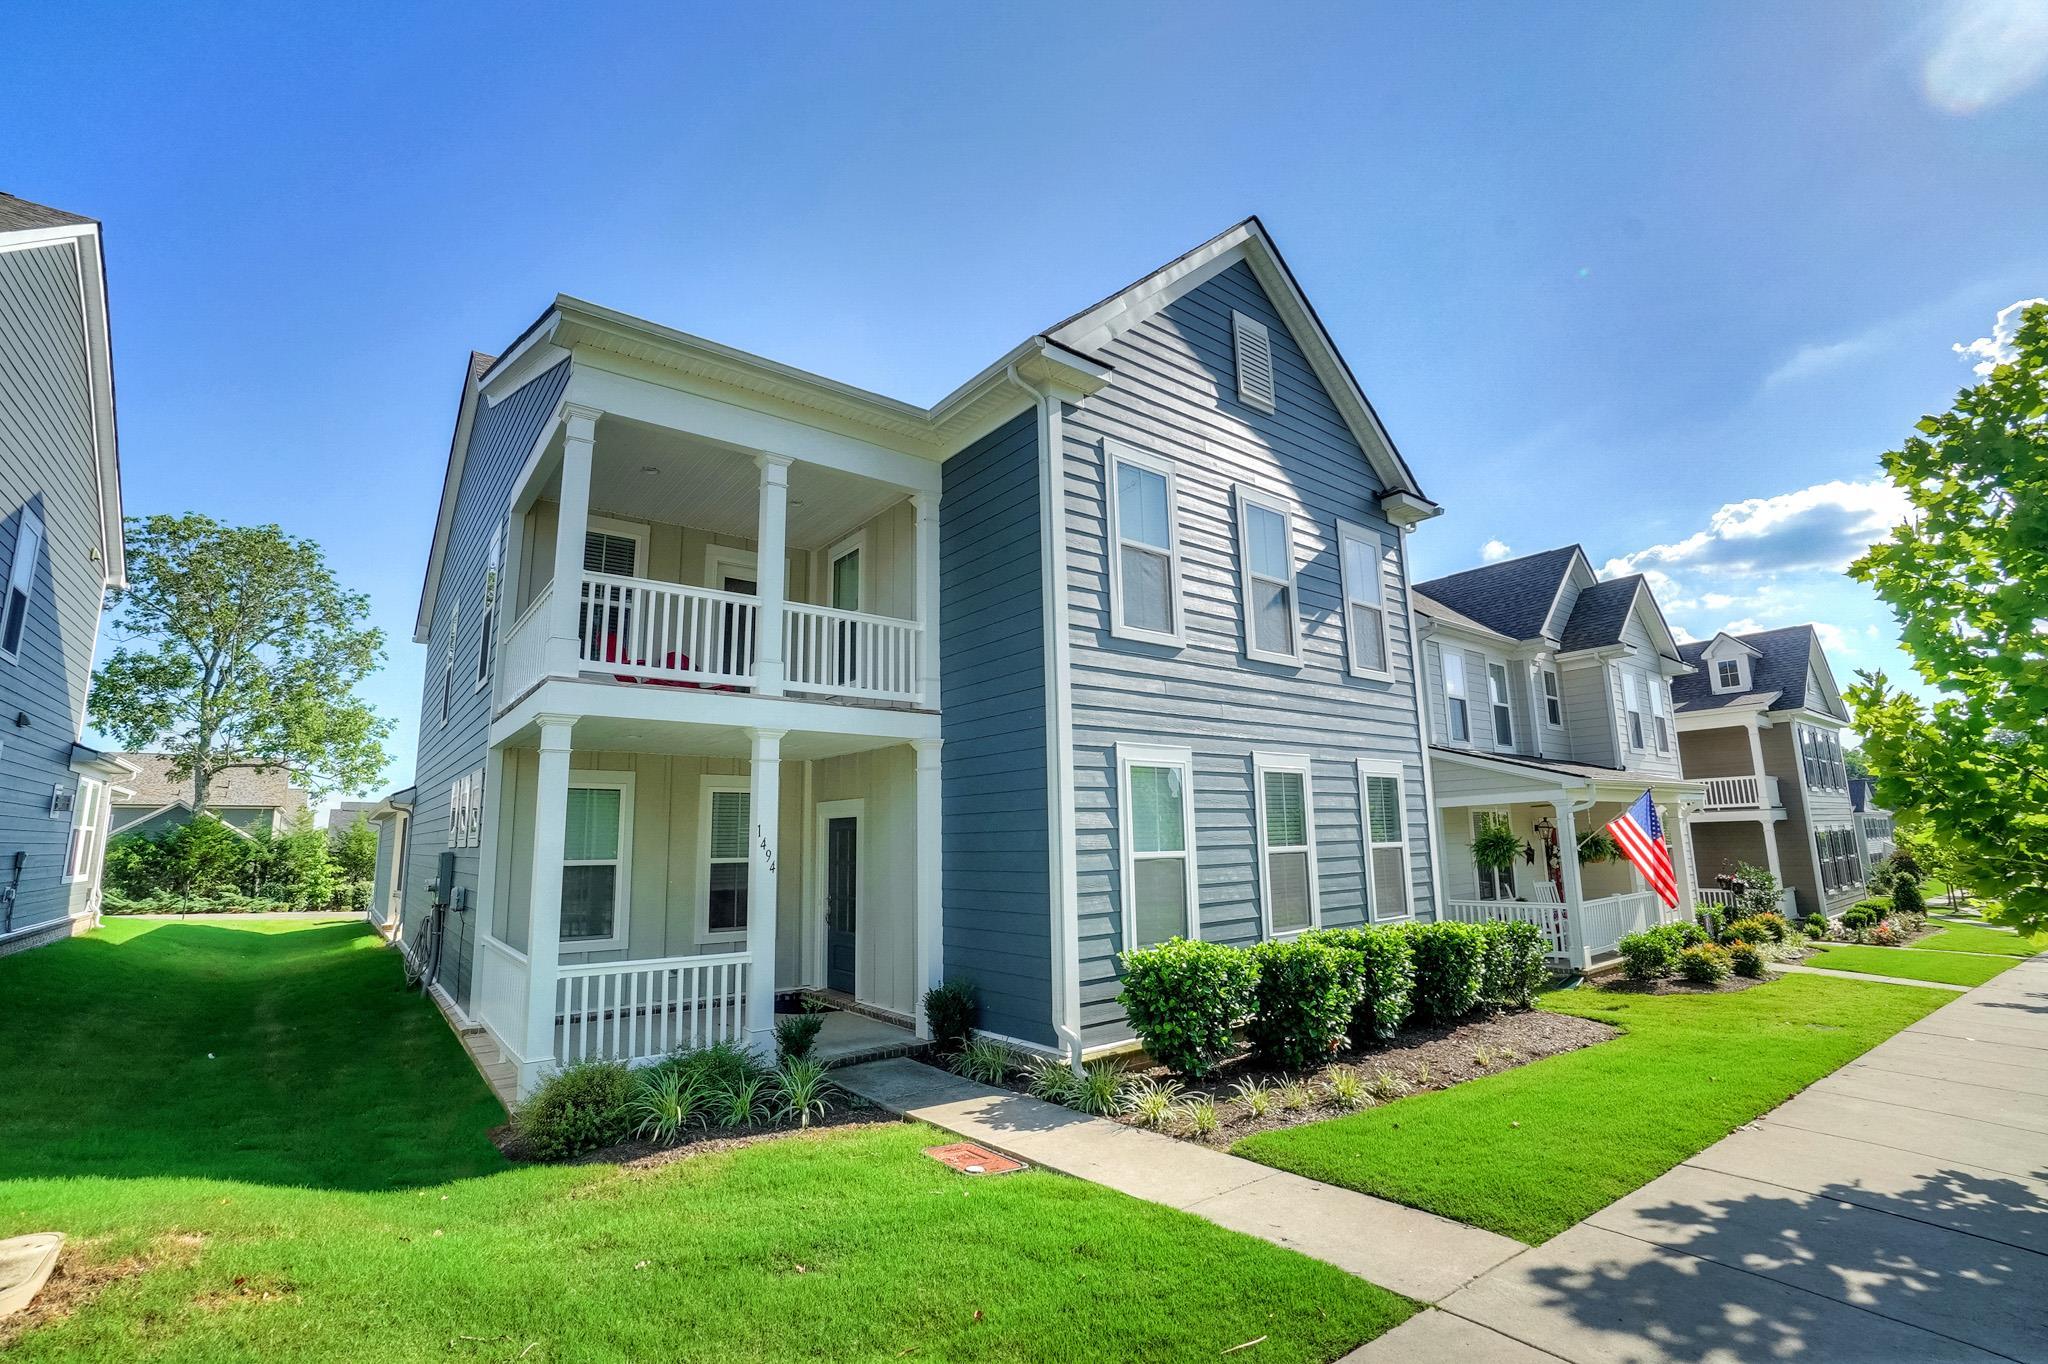 1494 Casner Ln, Franklin, TN 37067 - Franklin, TN real estate listing